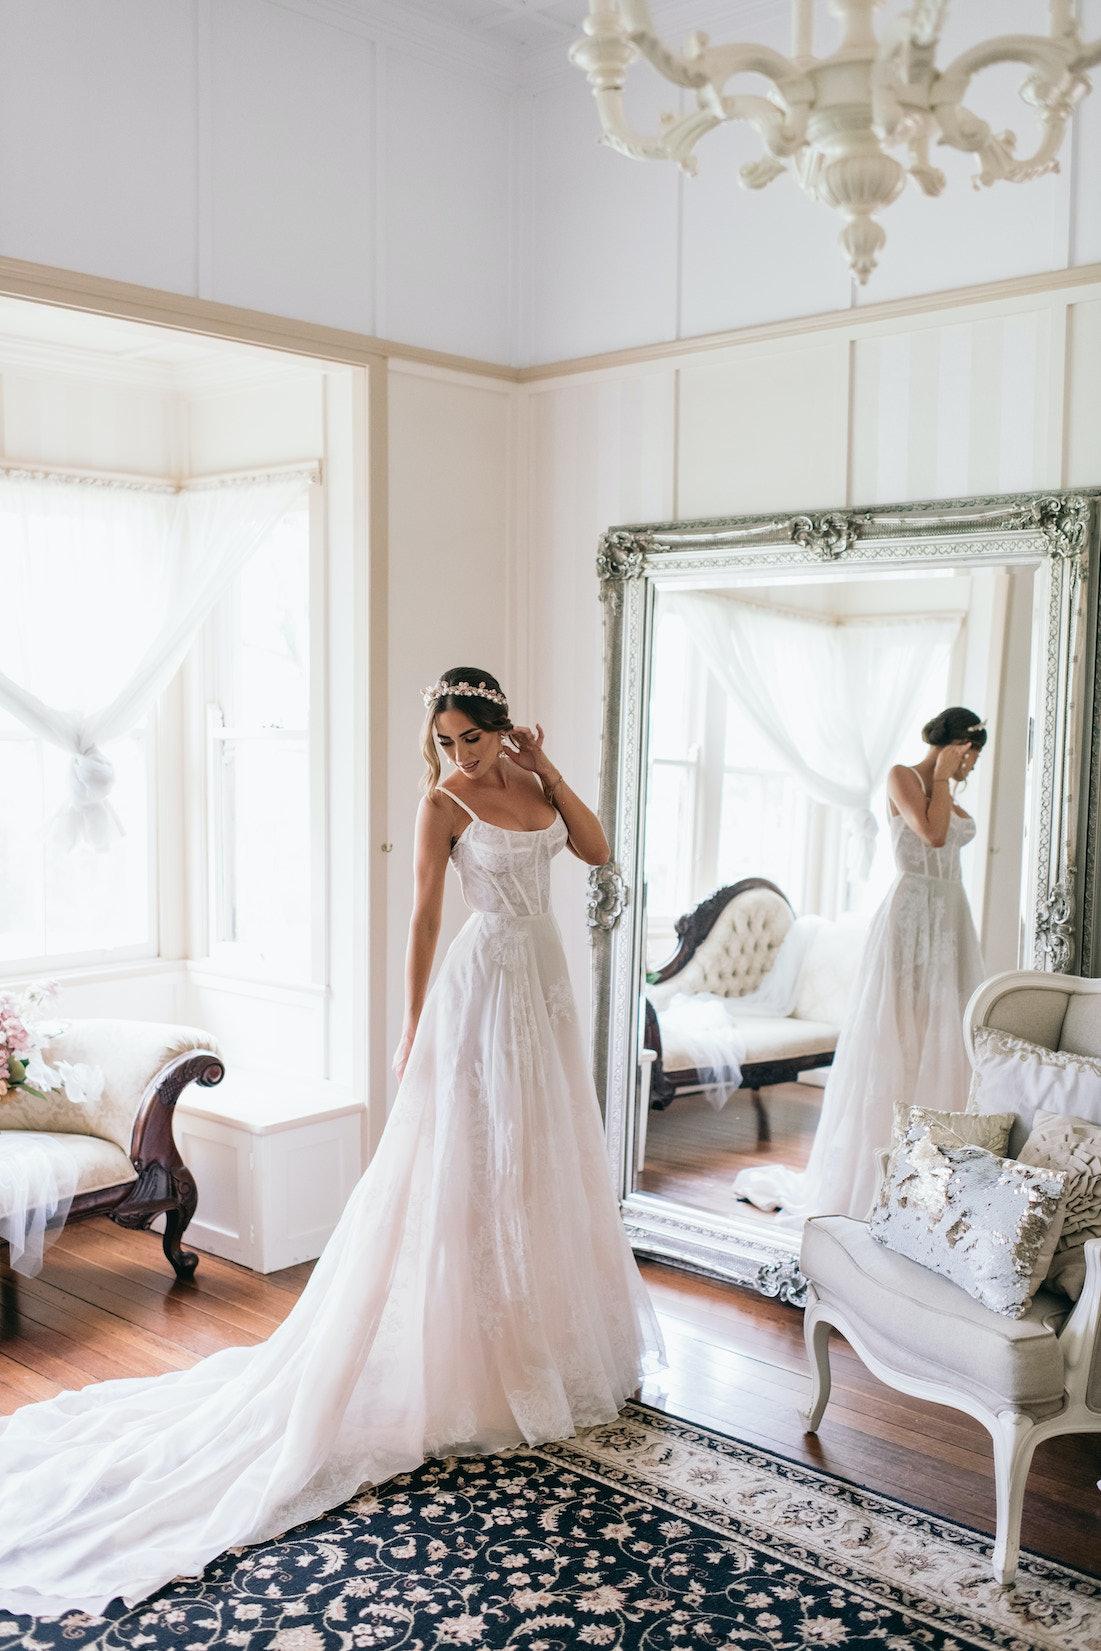 Bride standing in front of mirror in dress